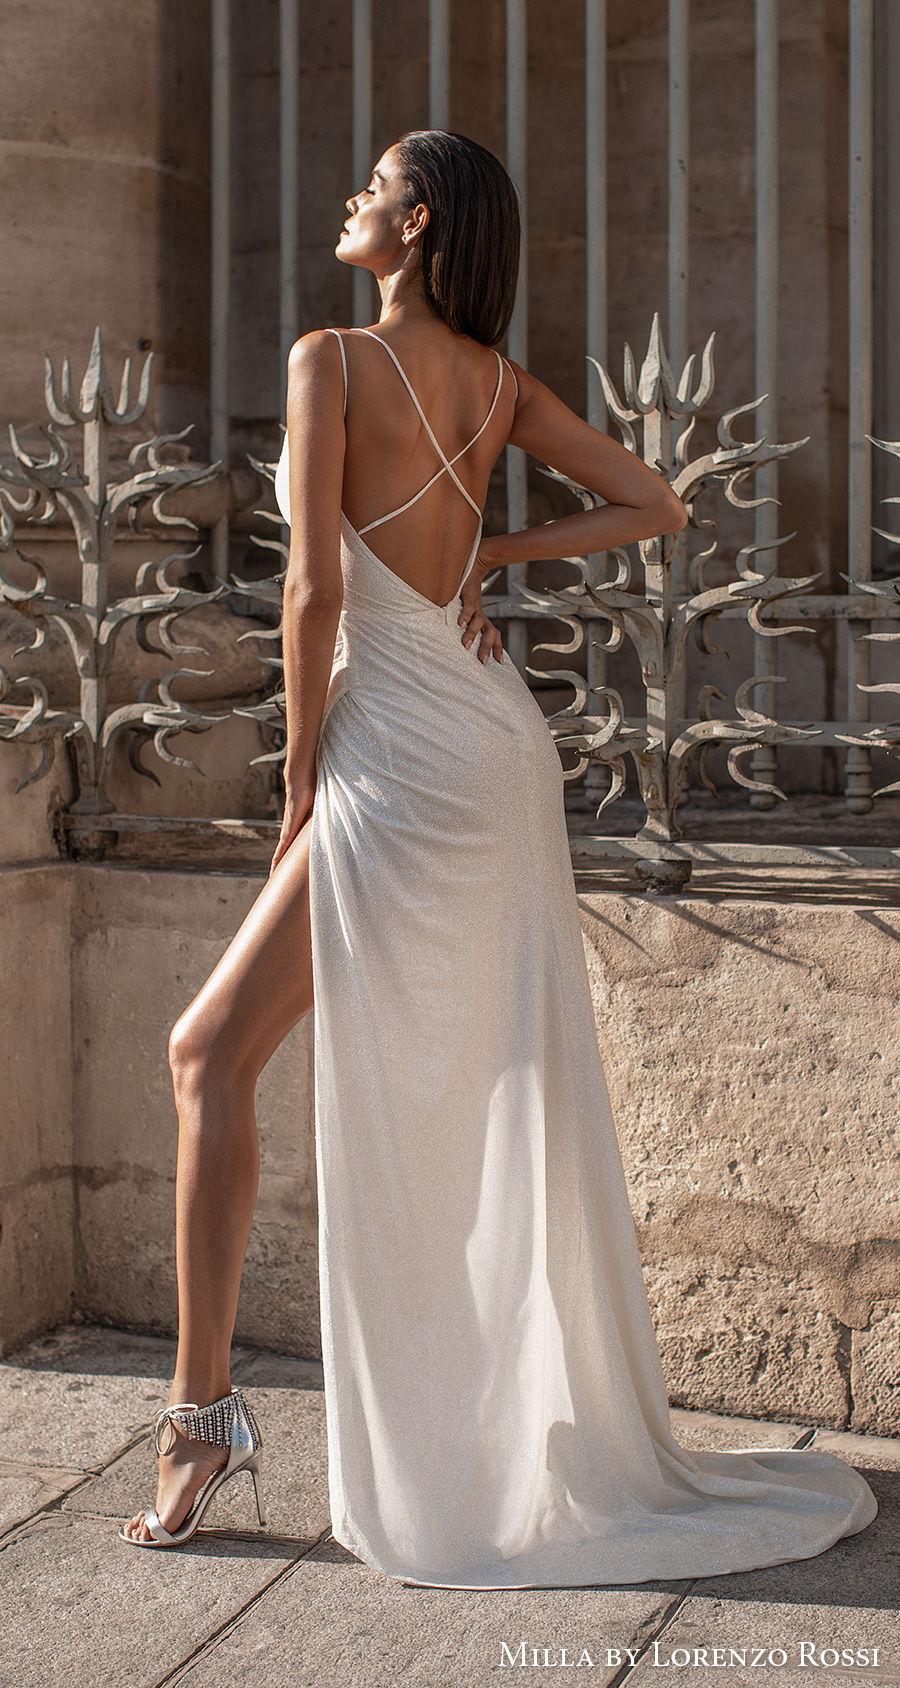 milla lorenzo rossi 2021 bridal double strap v neck wrap over bodice simple high slit skirt sheath wedding dress cross strap back (josie) bv